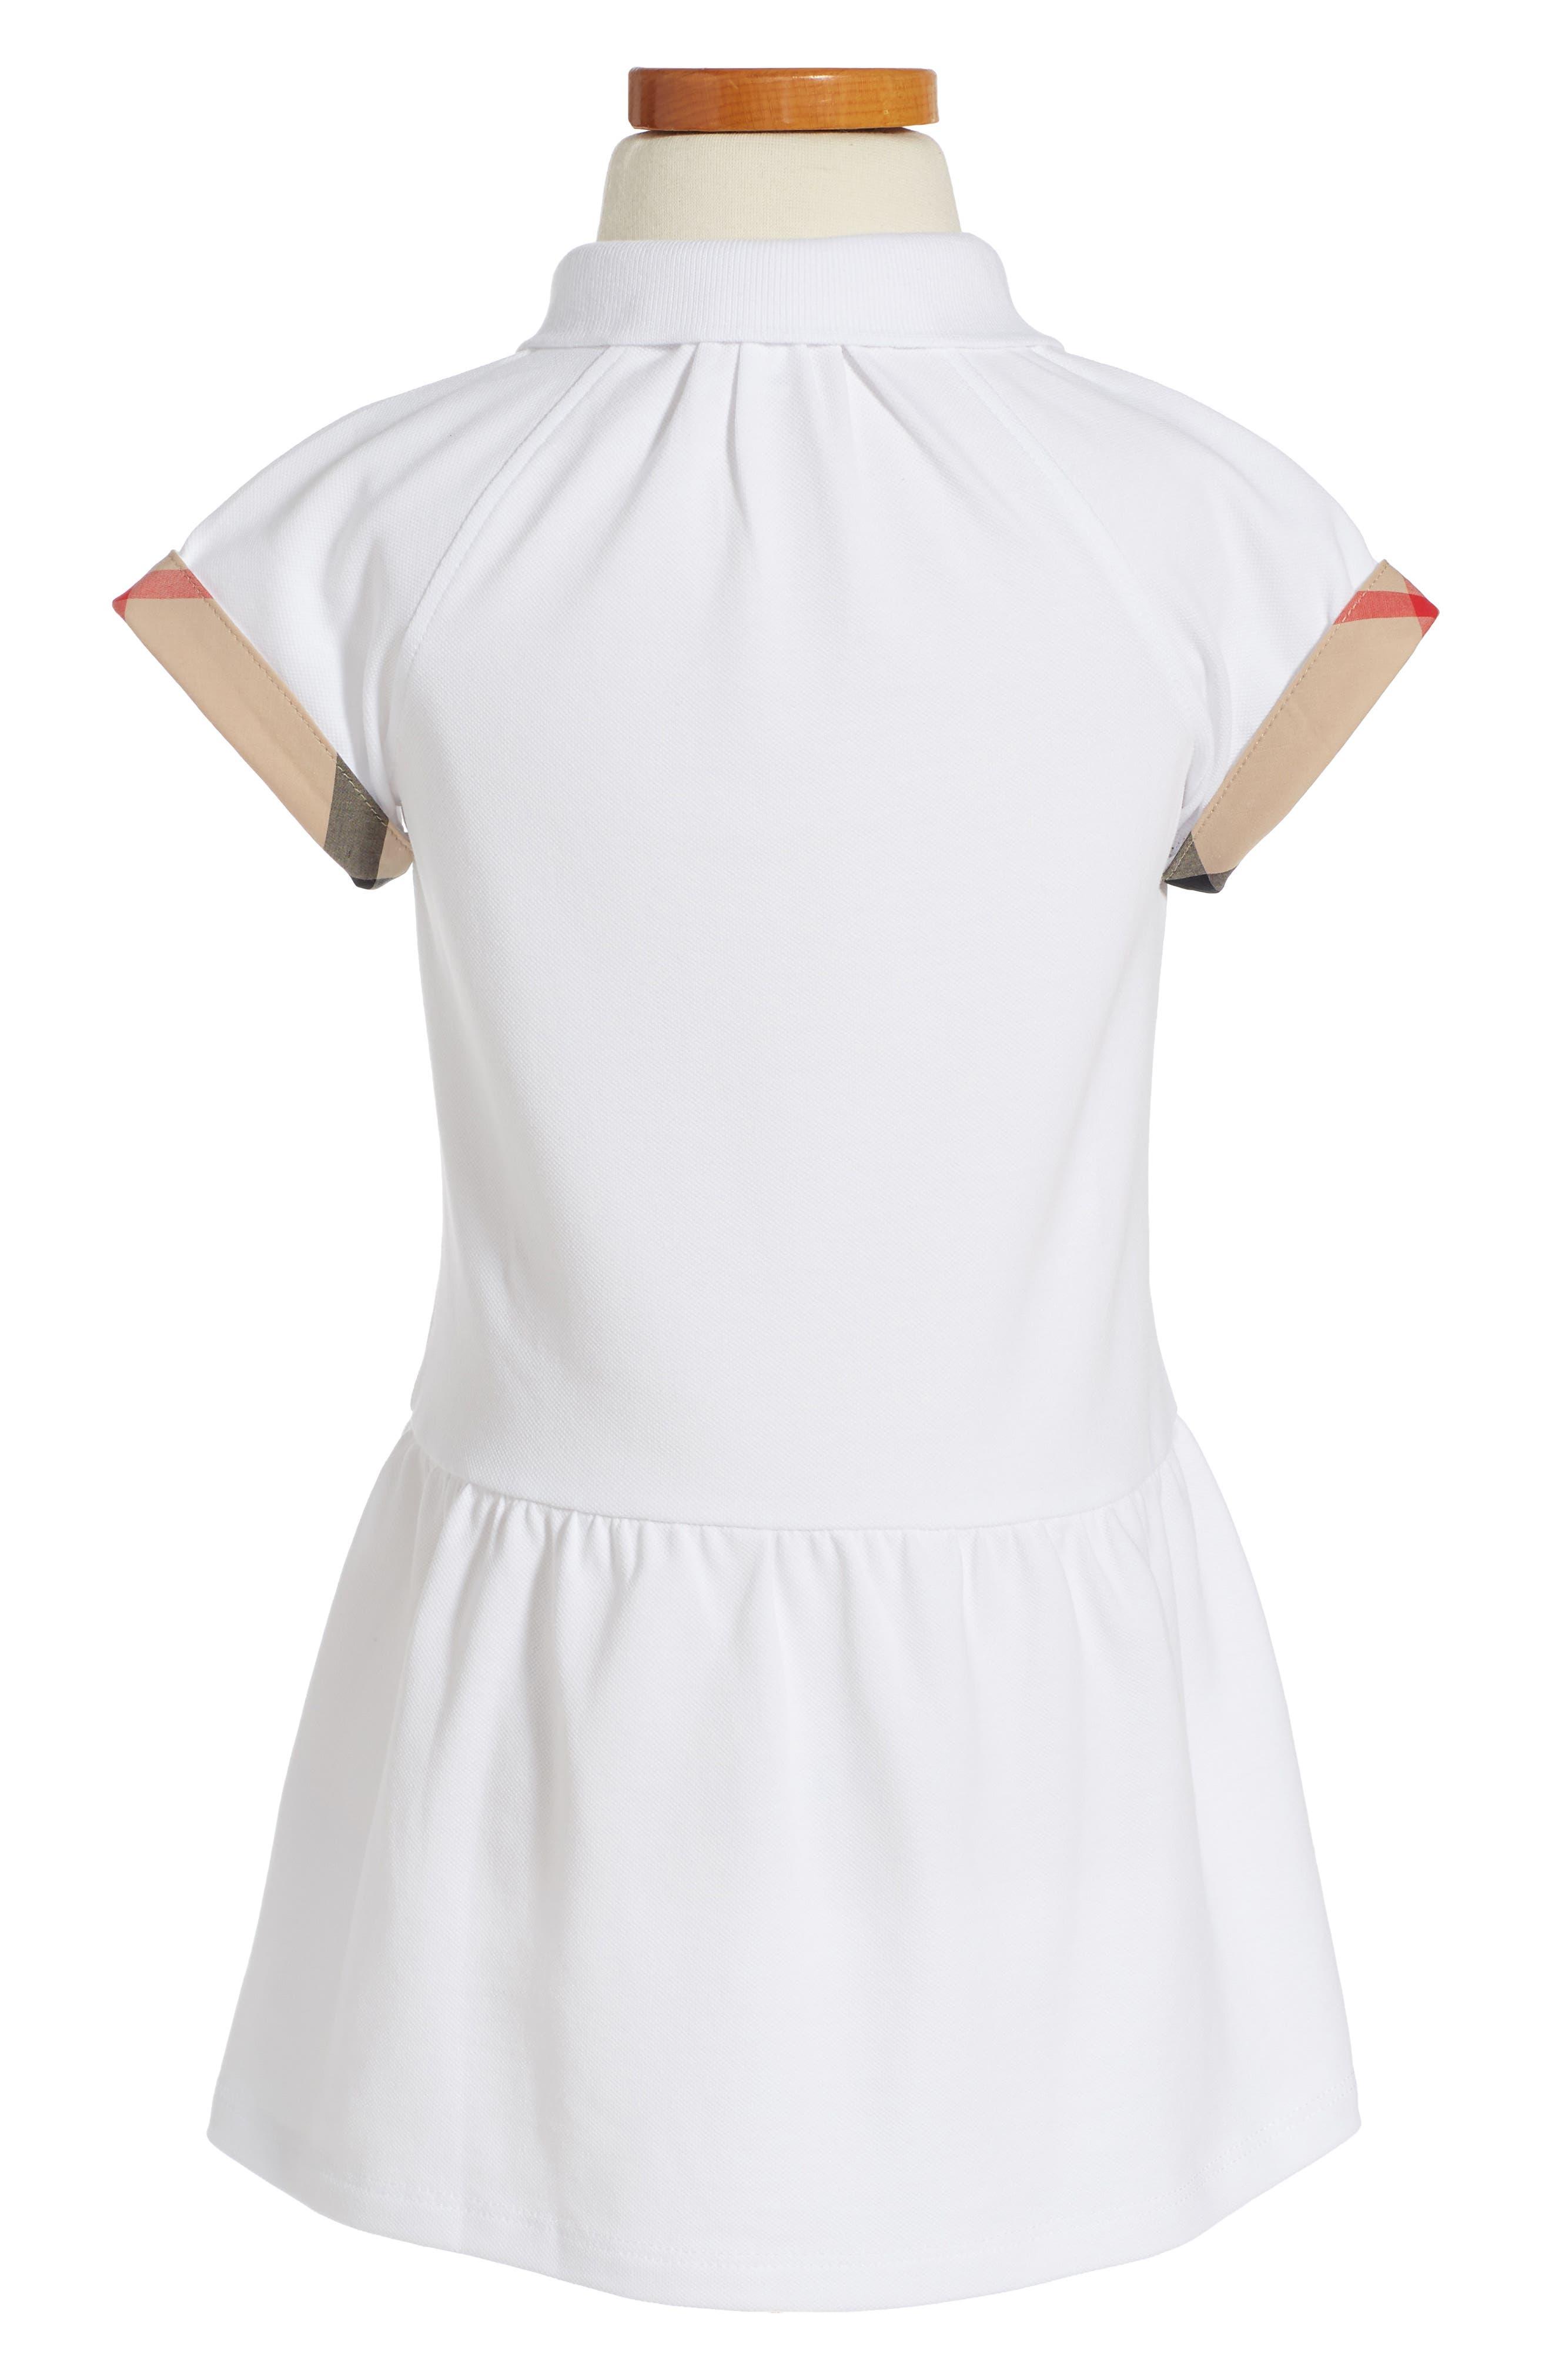 Alternate Image 2  - Burberry Mini Cali Polo Dress (Toddler Girls)